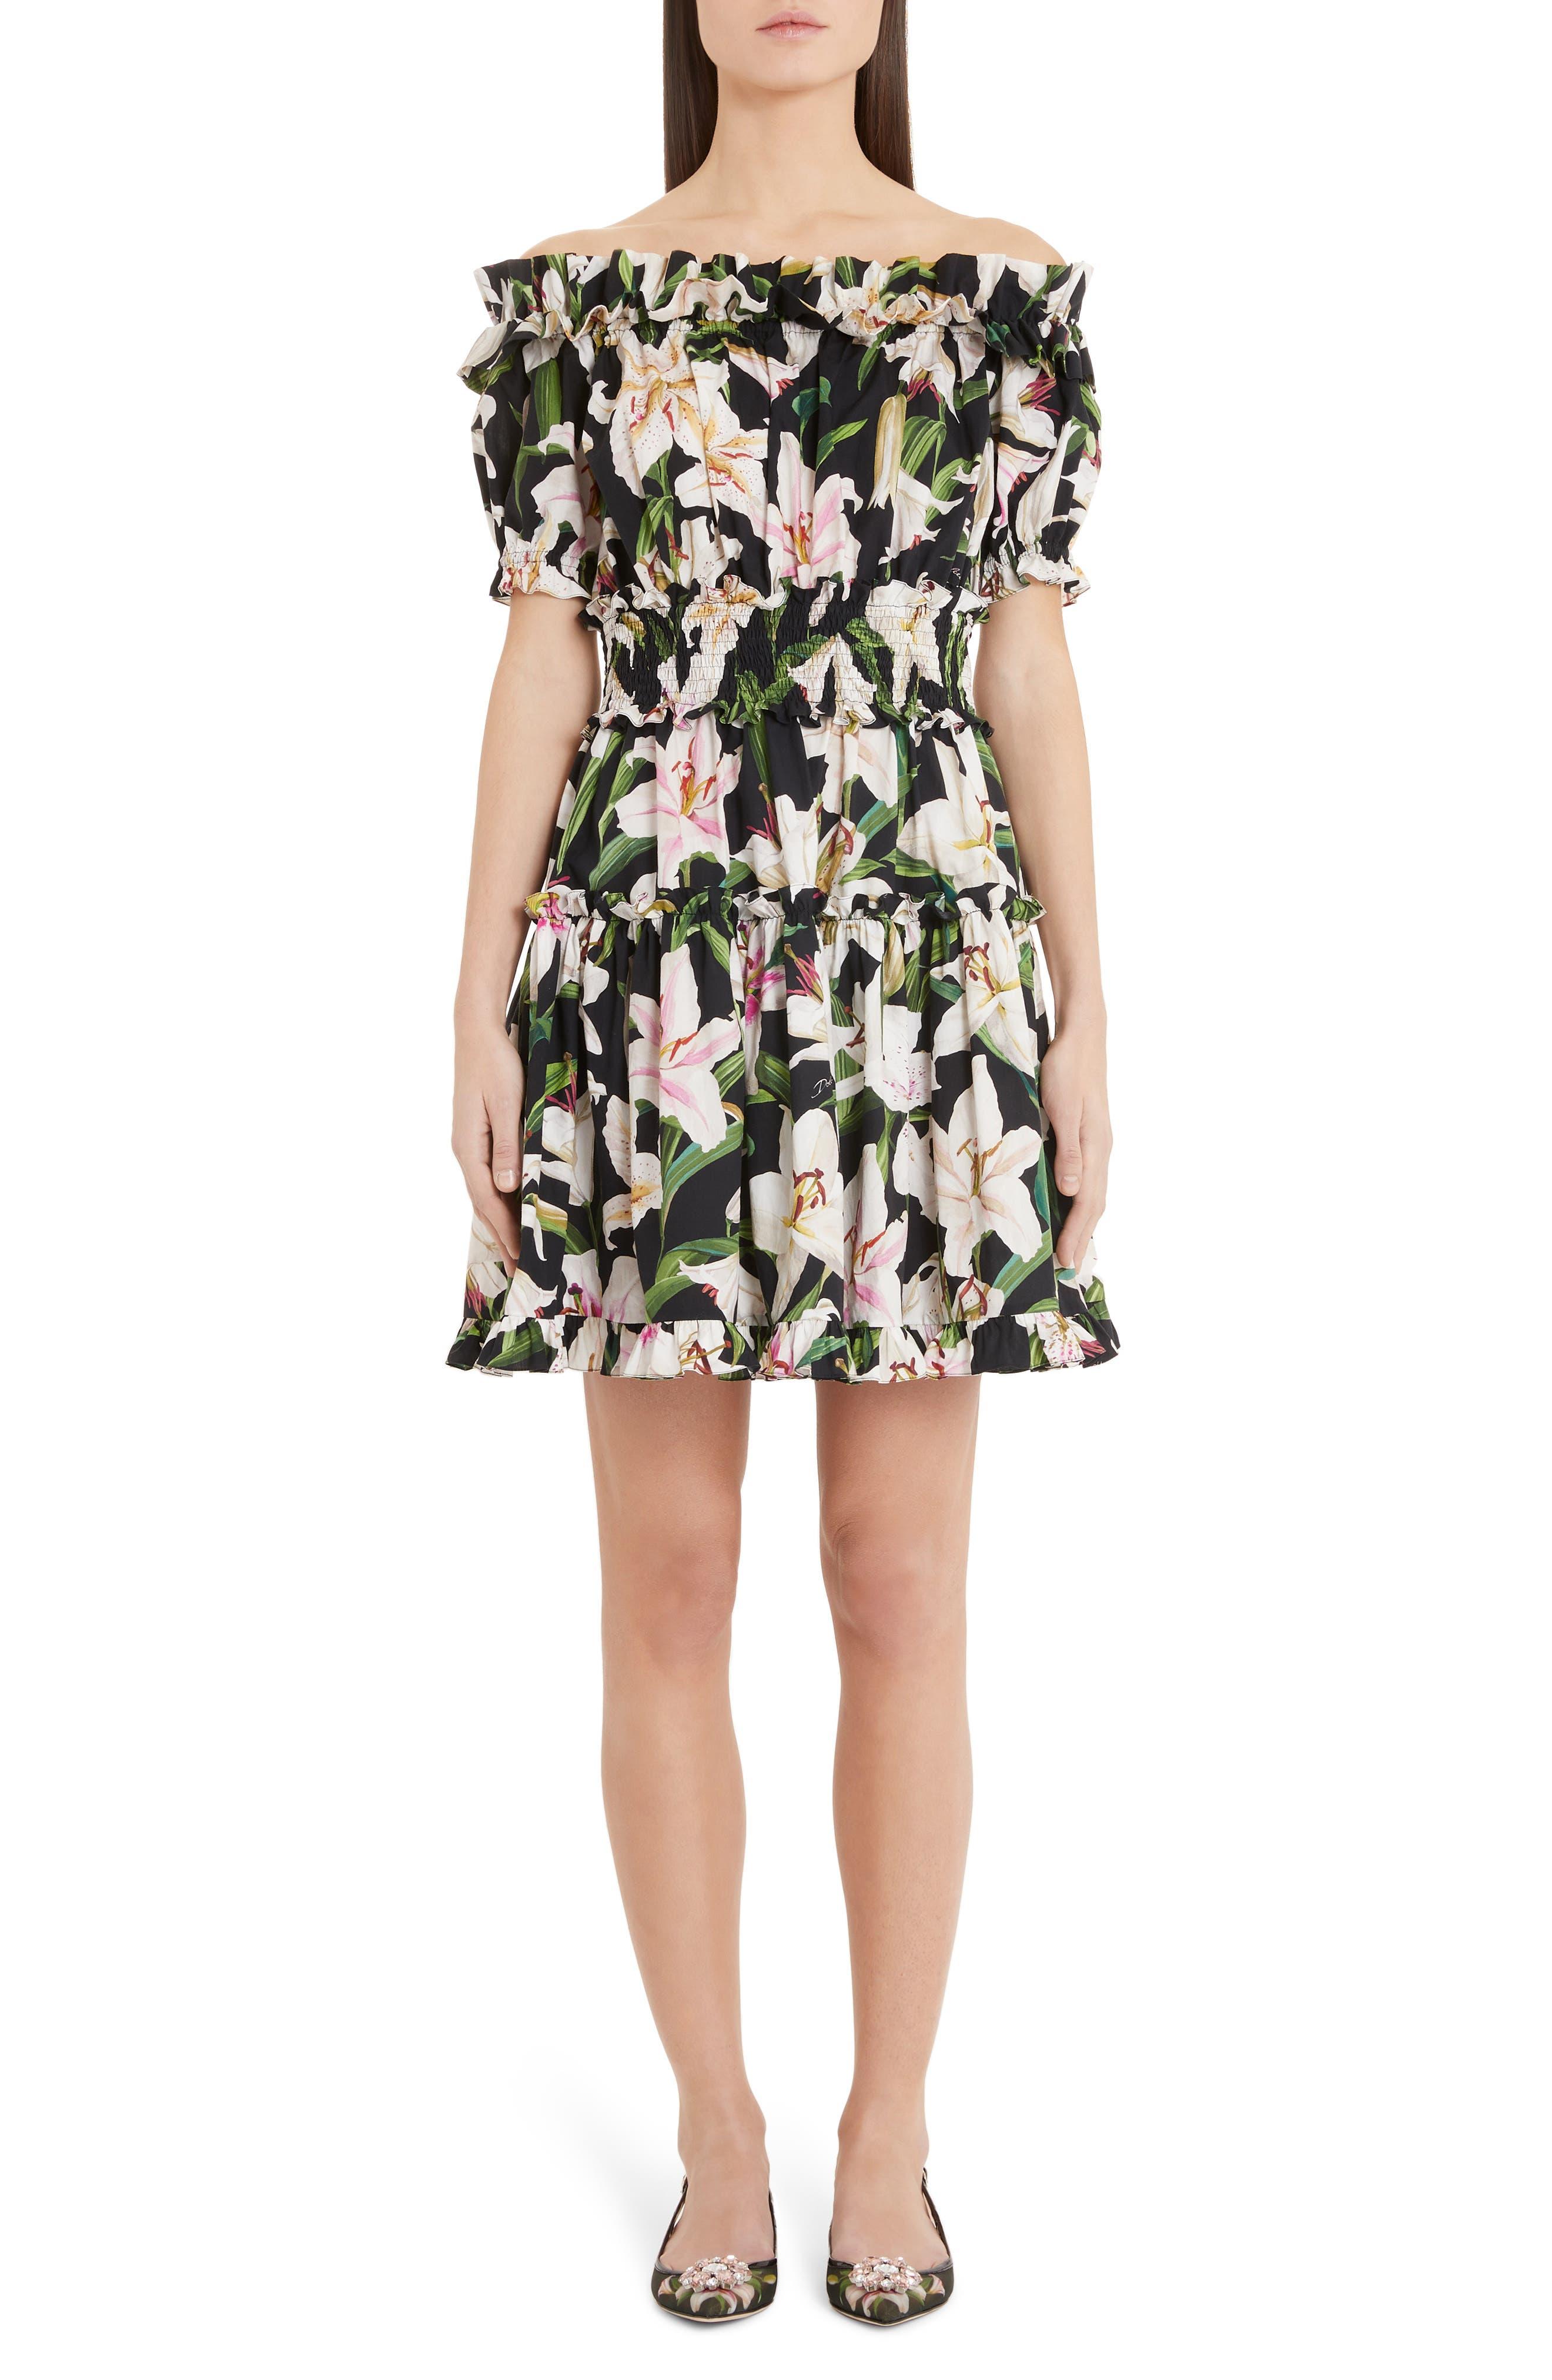 Dolce & gabbana Lily Print Off The Shoulder Minidress, US / 44 IT - Black